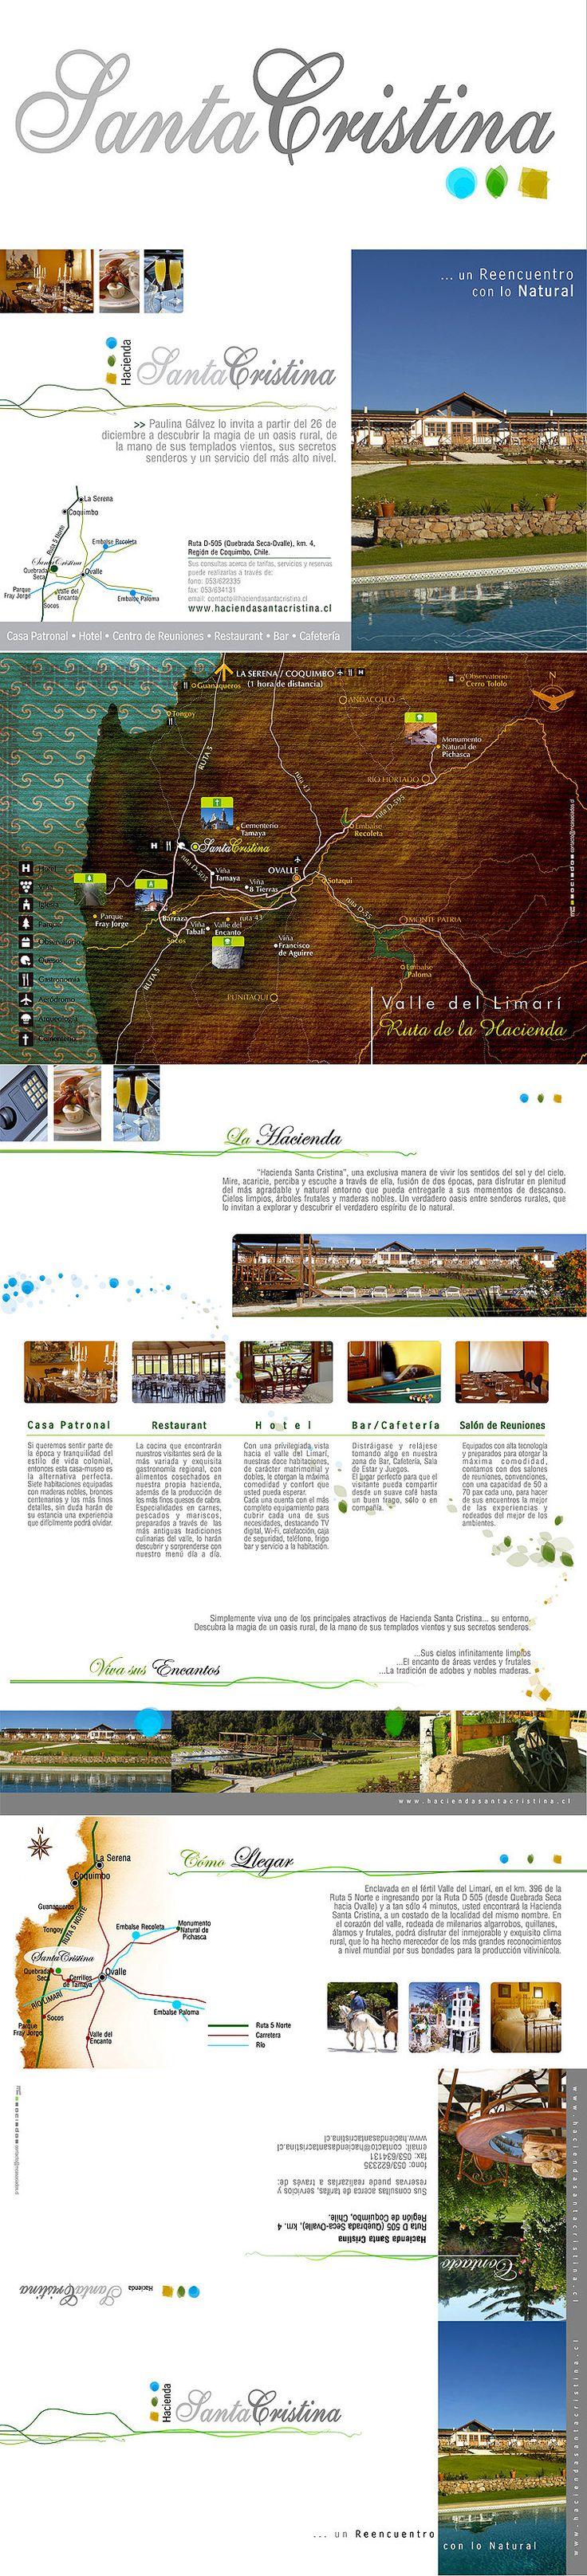 2007/Hacienda Santa Cristina on Behance #design #graphic #branding